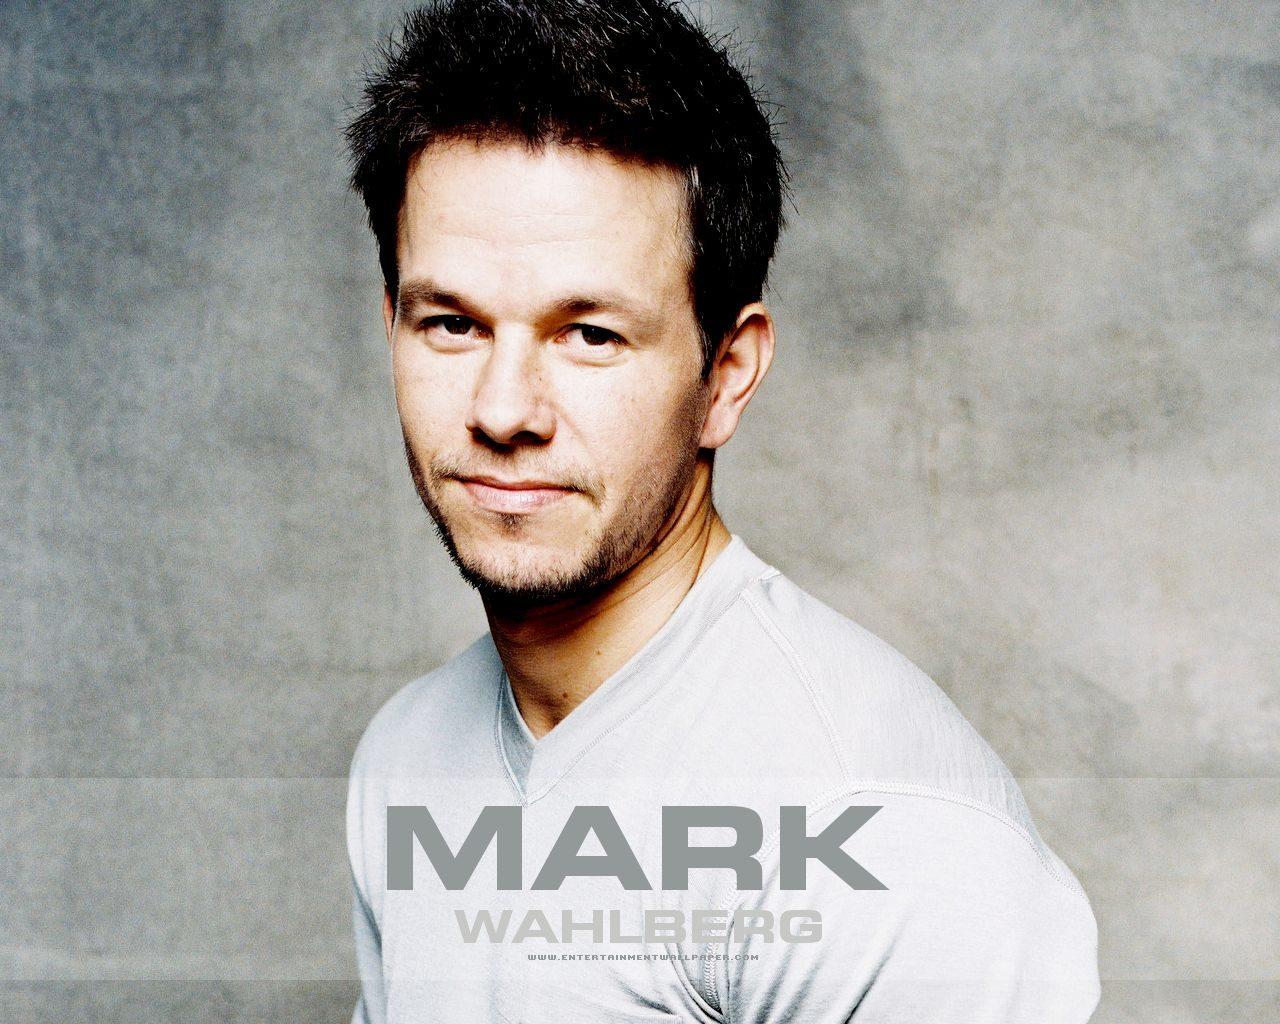 Mark Wahlberg wallpaper 1280x1024 4544 1280x1024